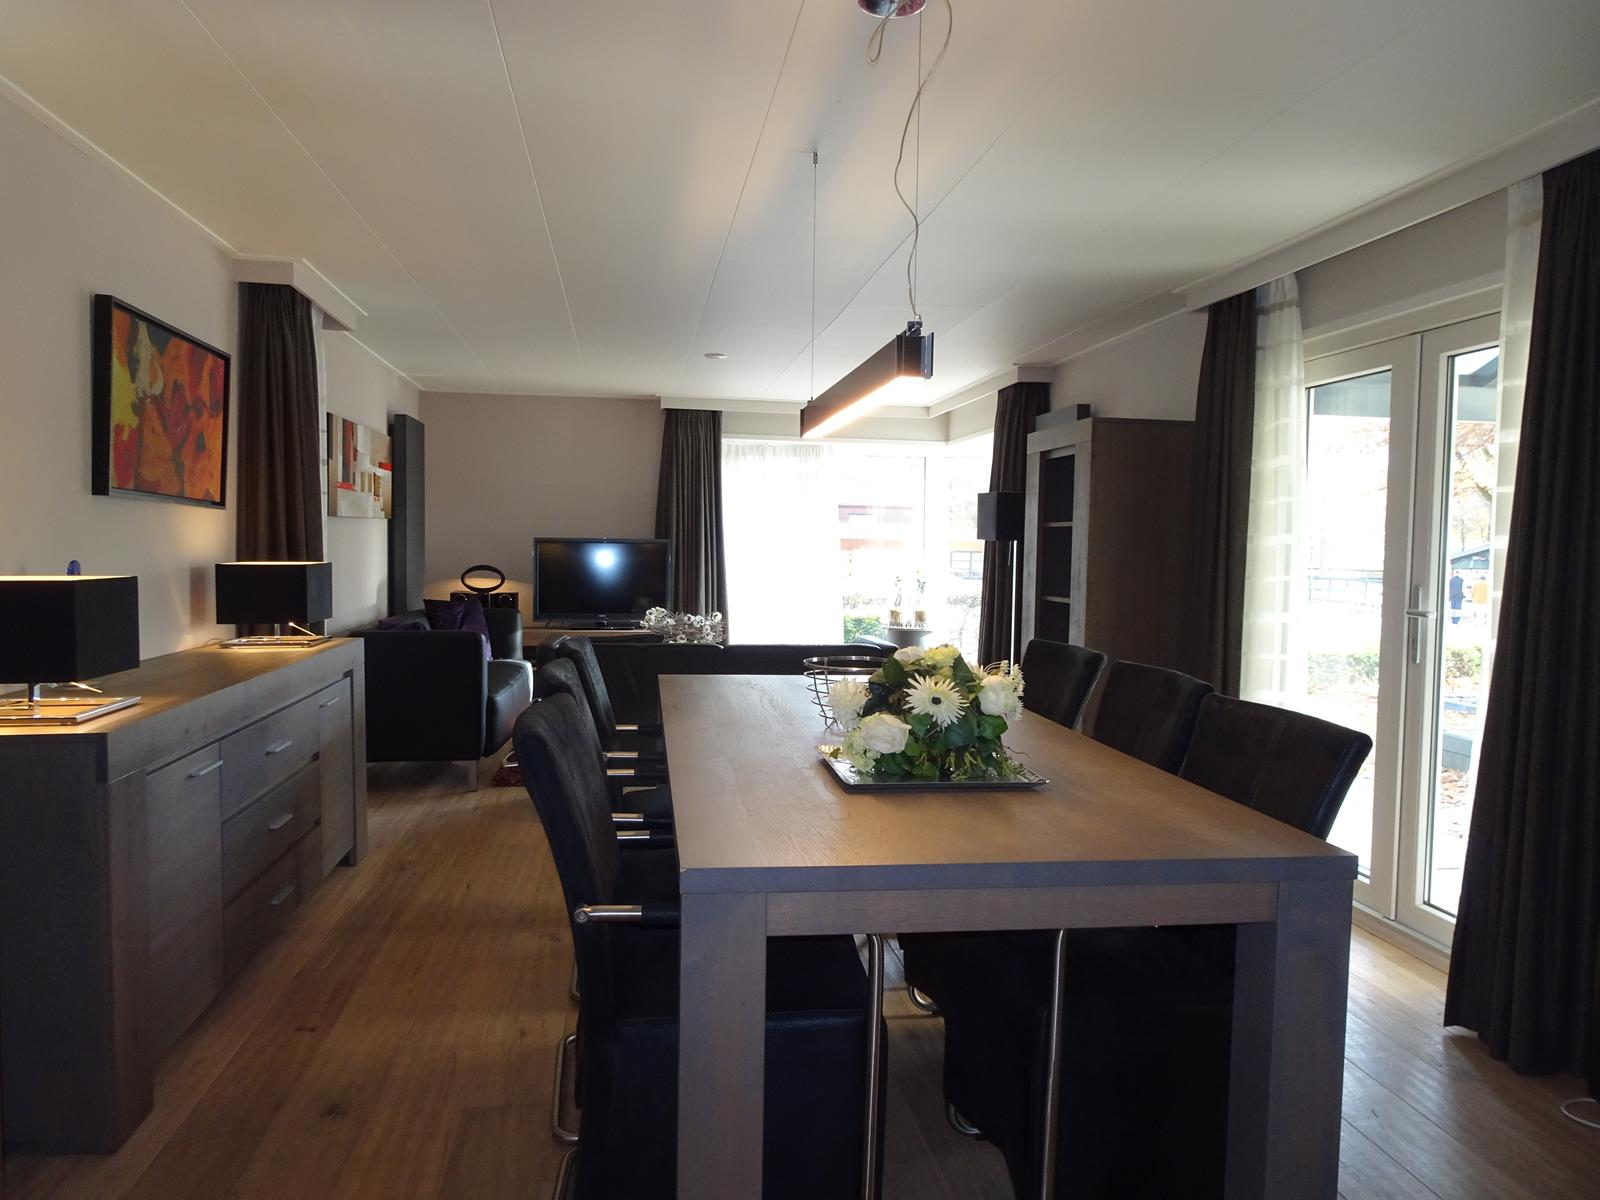 Vakantiehuis te koop Limburg Susteren Hommelweg 2 K121 (4).jpg